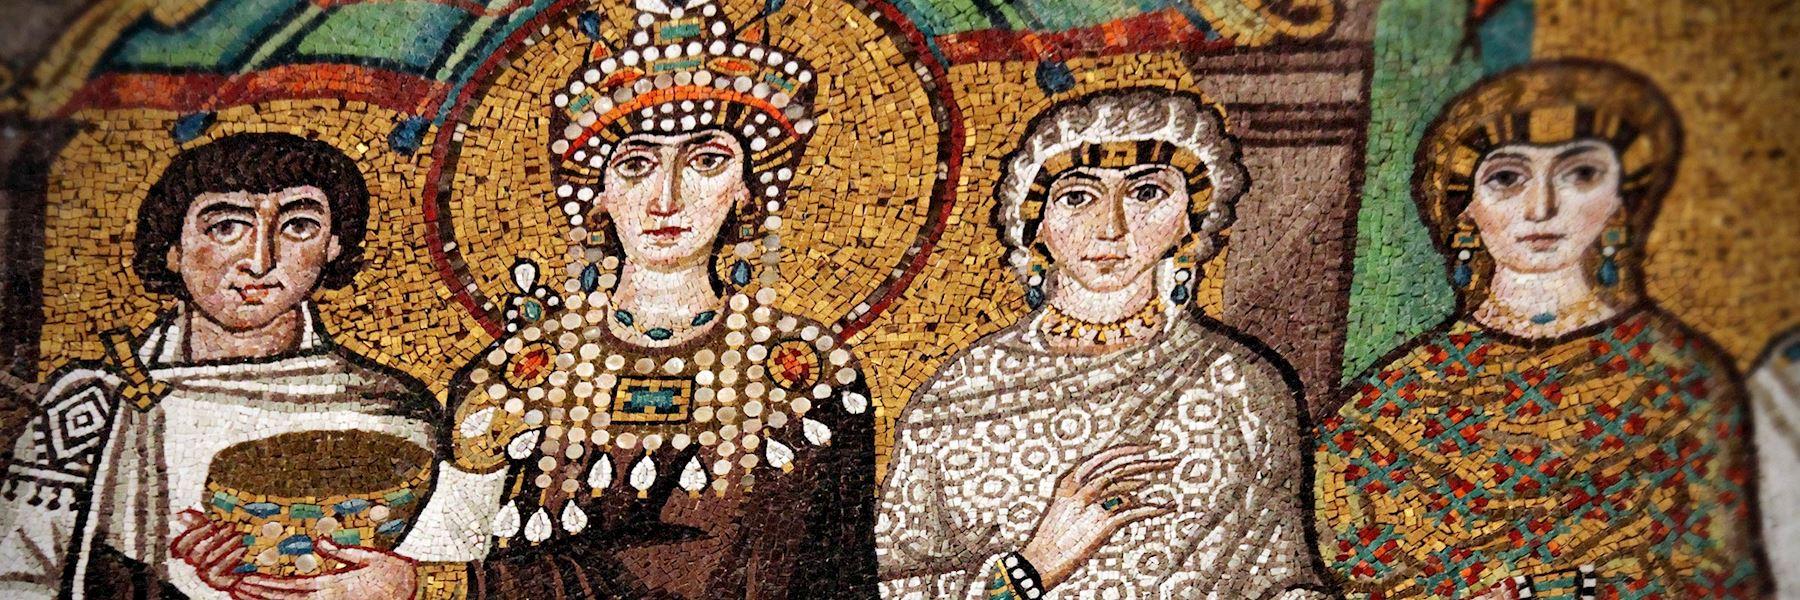 Visit Ravenna, Italy